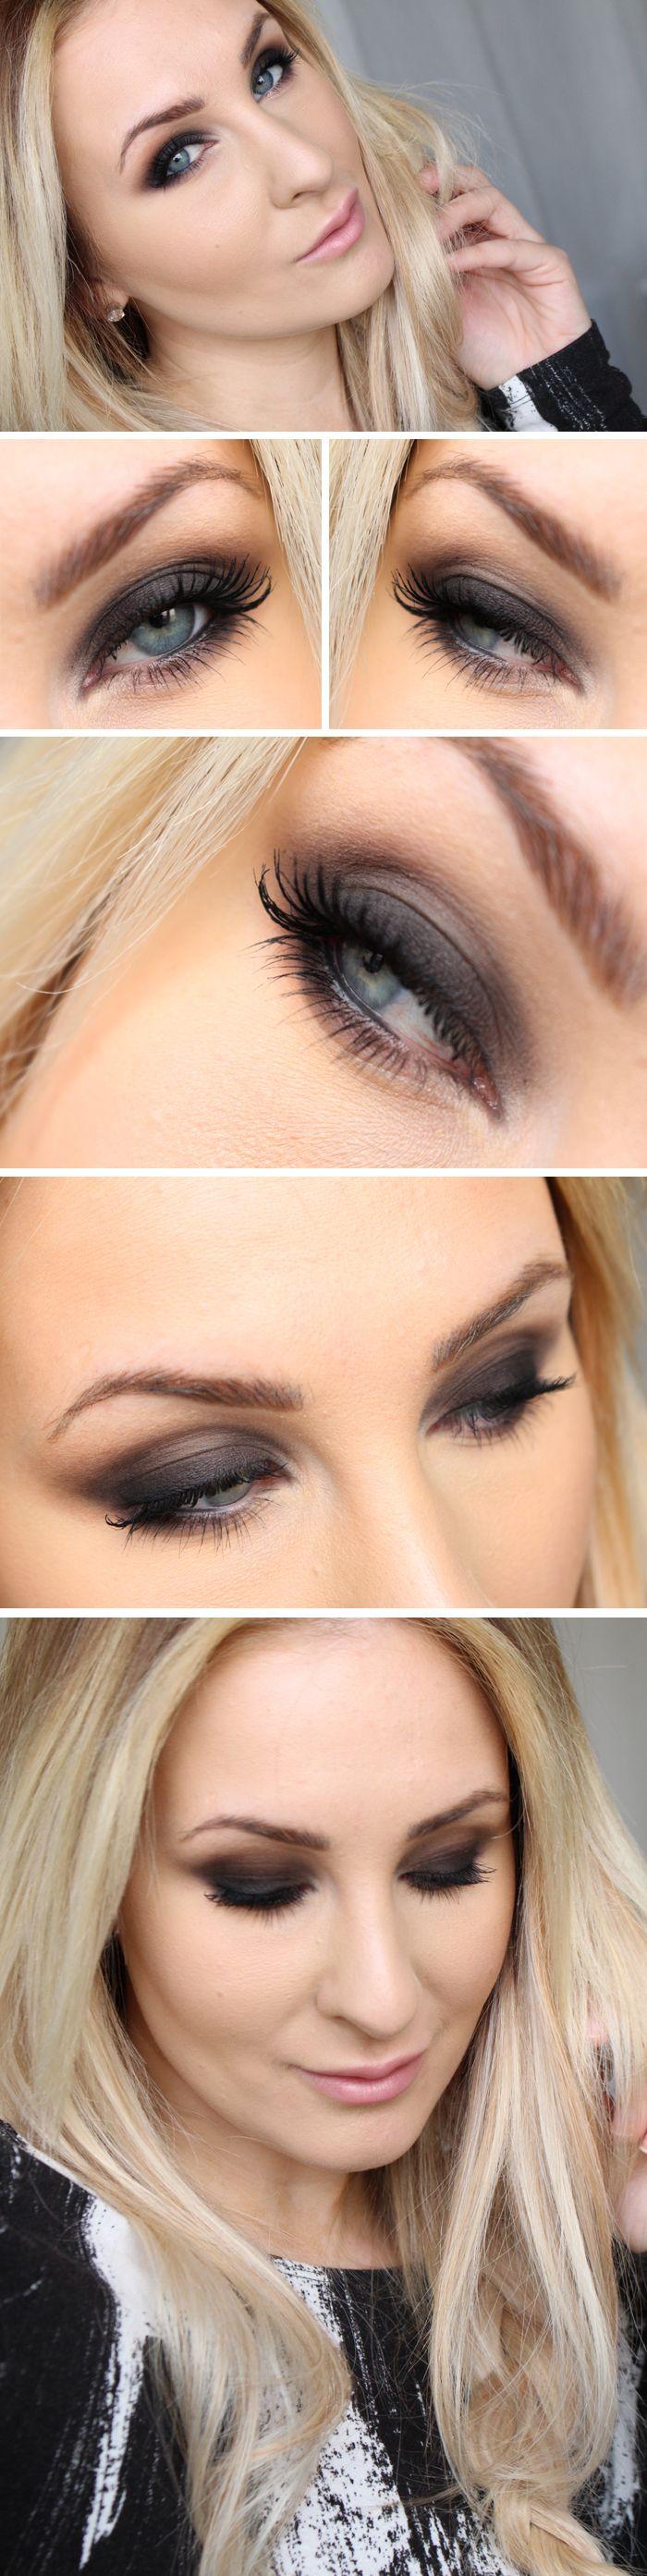 hiilen dagens makeup sotade ögon smokey eye hiilen sminkblogg skönhetsblogg